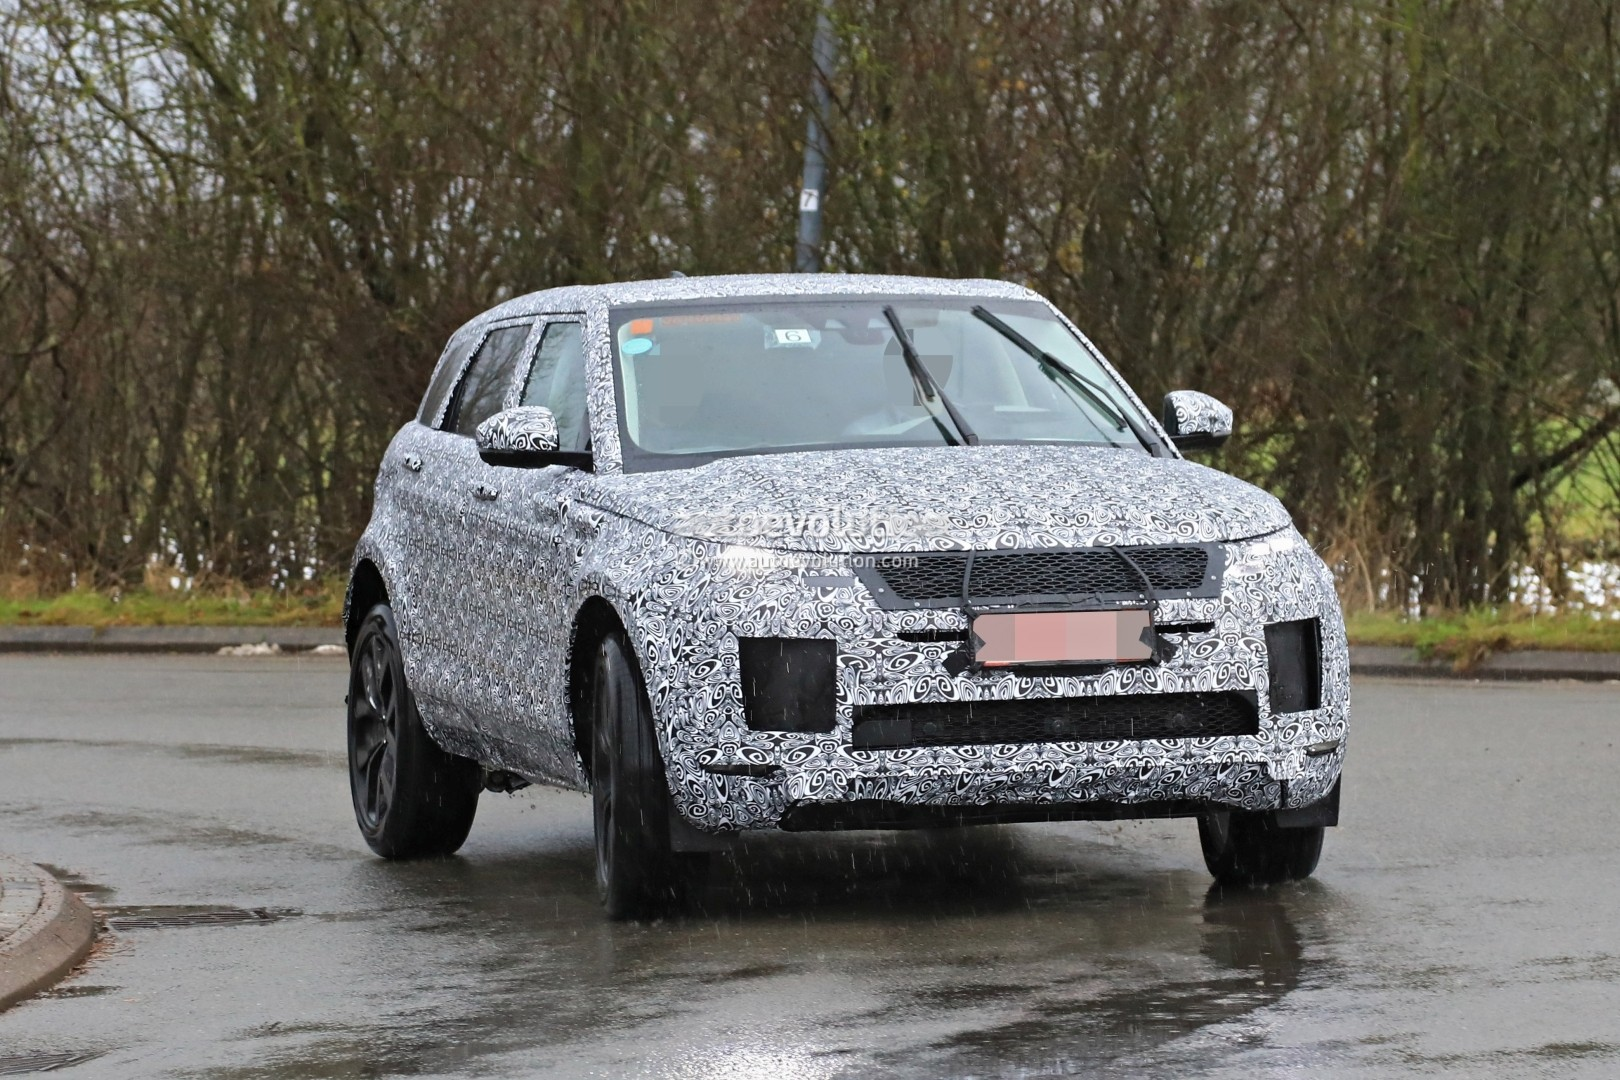 Spyshots 2019 Range Rover Evoque Has Production All Led